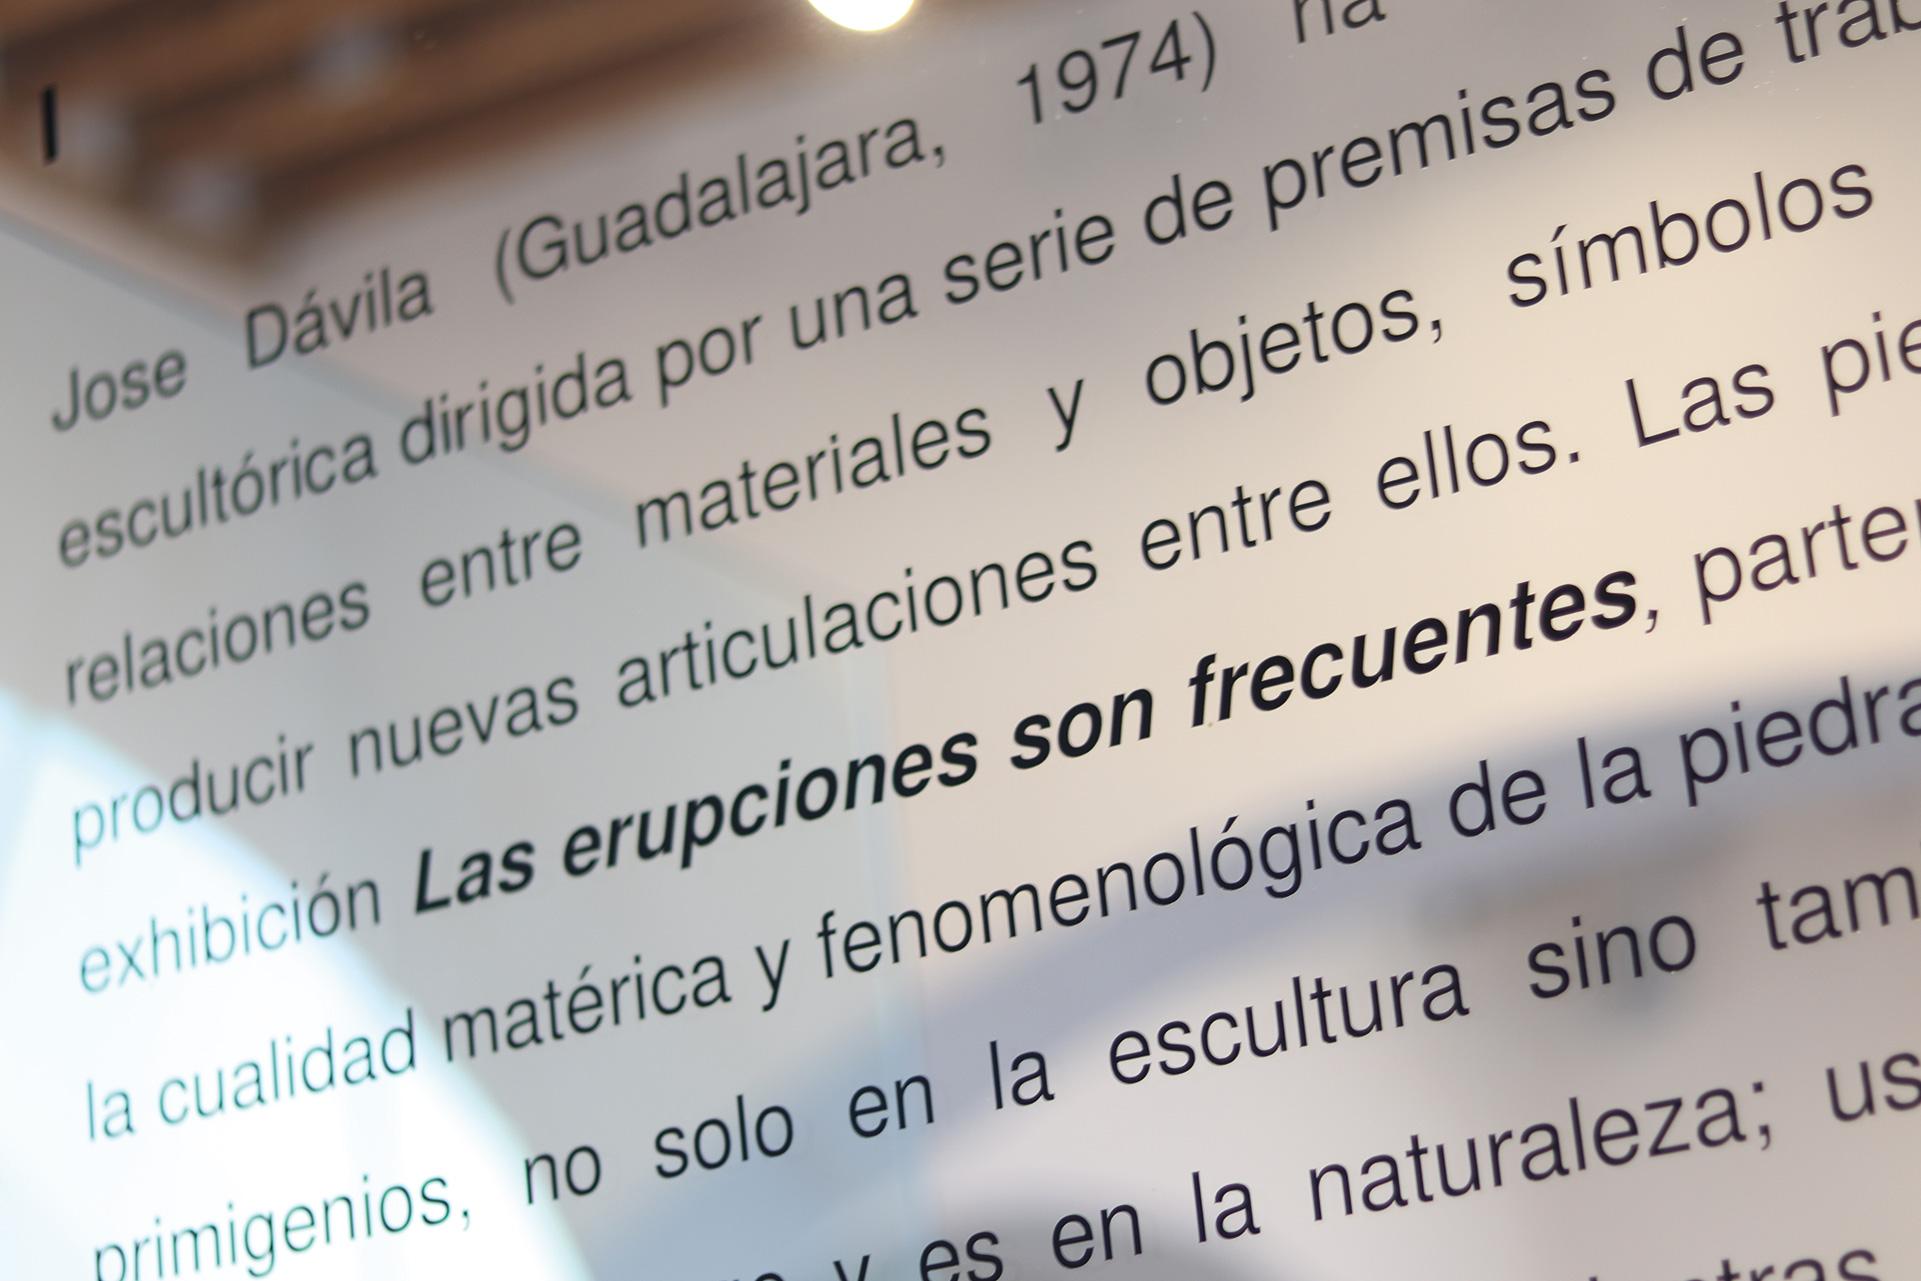 HLasErupcionesSonFrecuentes_Web3